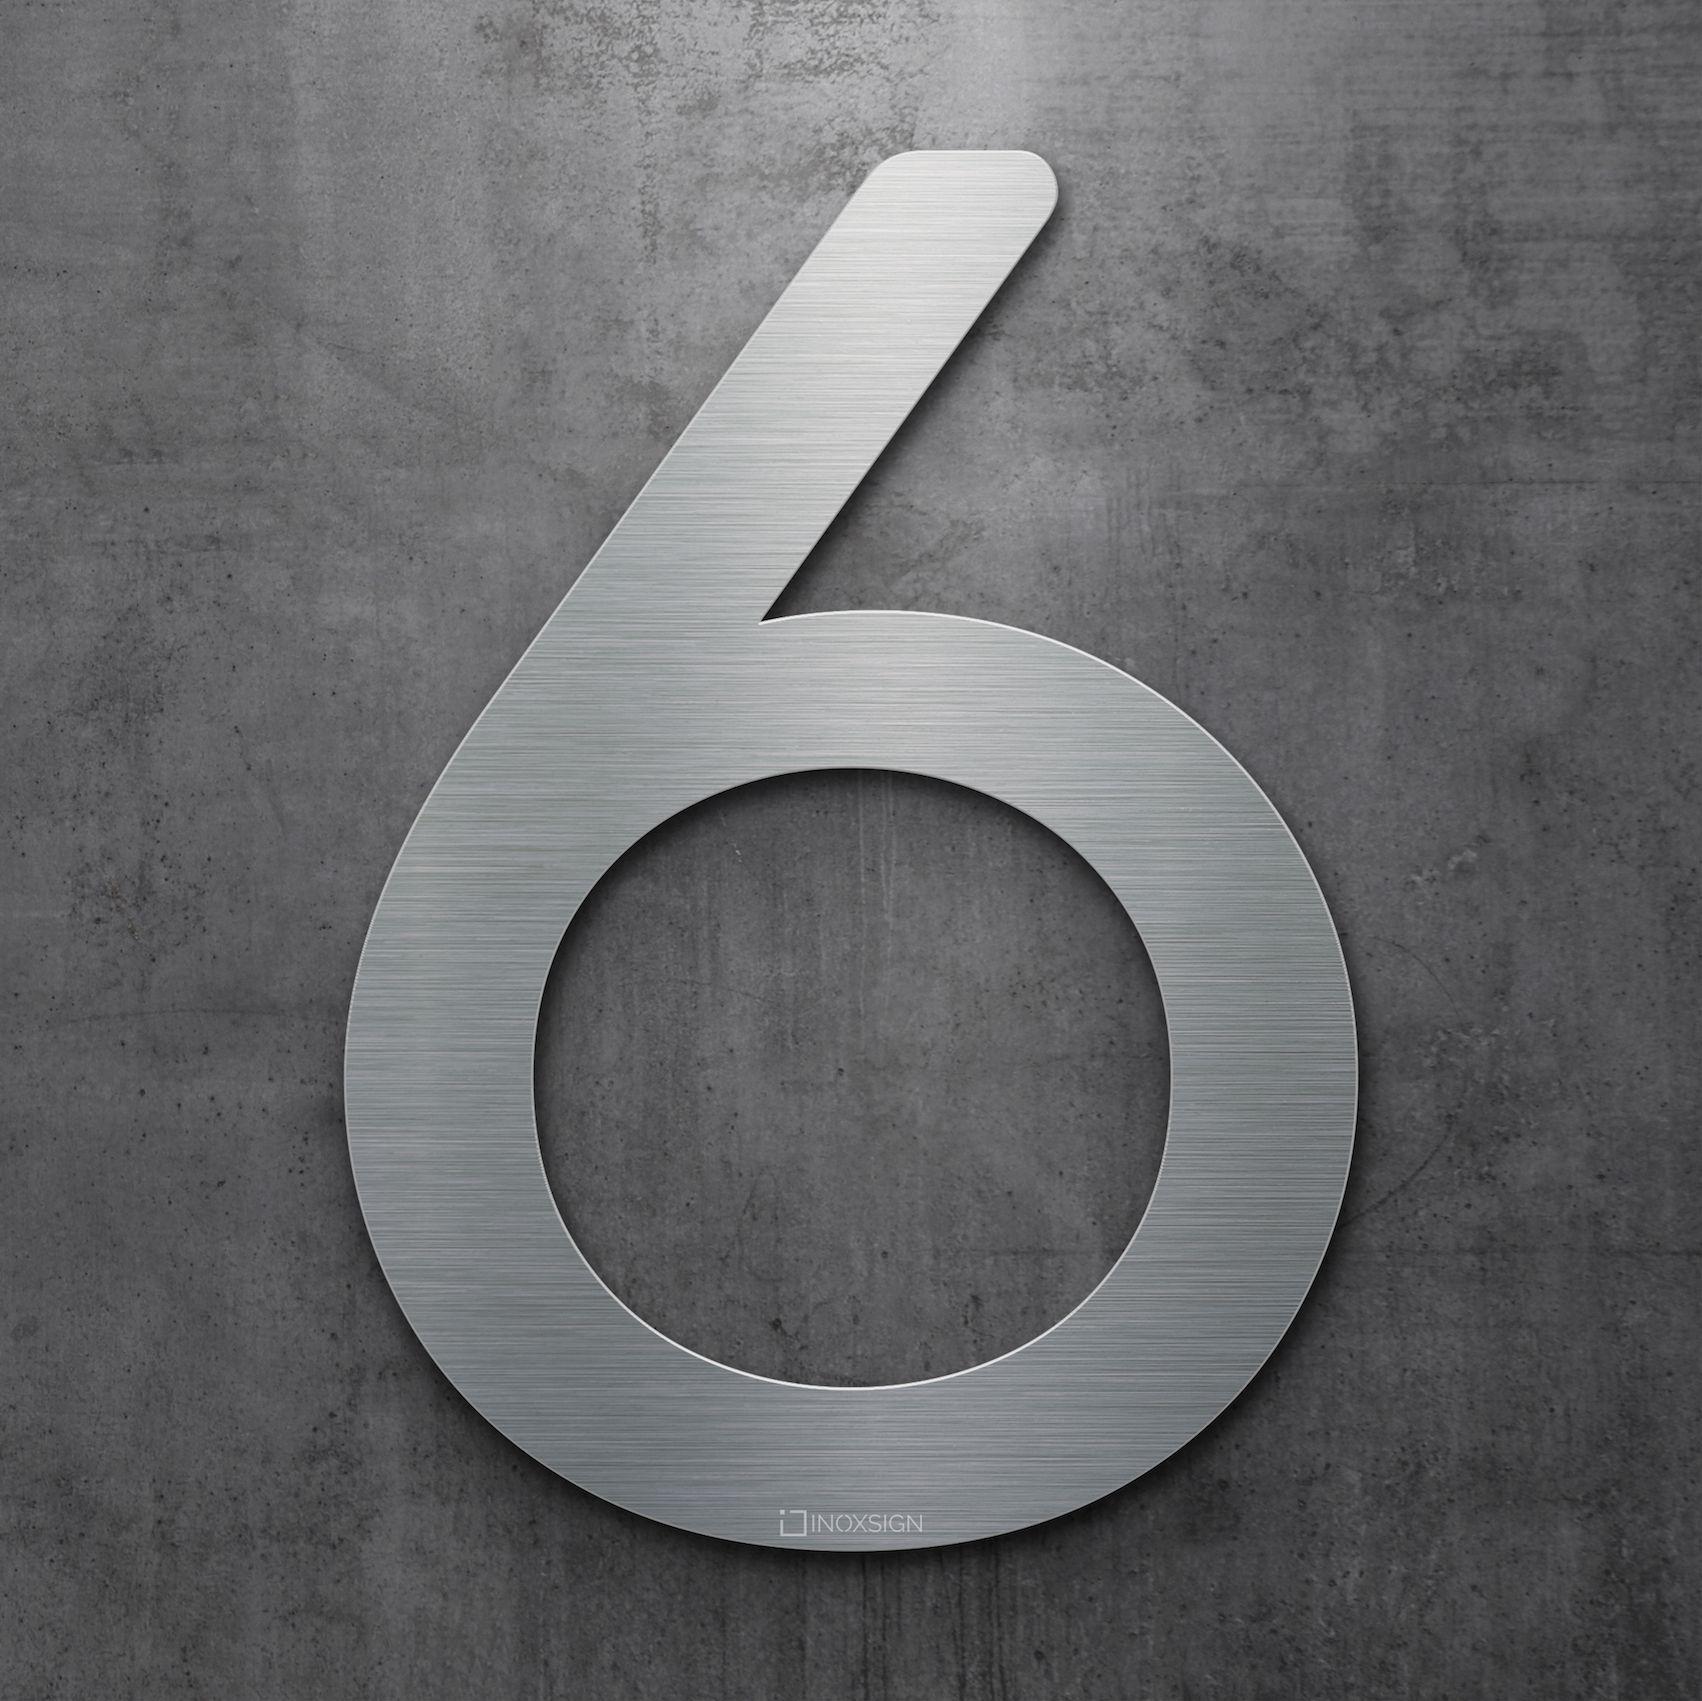 neu inoxsign edelstahl hausnummer 6 moderne hausnummern aus edelstahl geb rstet design. Black Bedroom Furniture Sets. Home Design Ideas